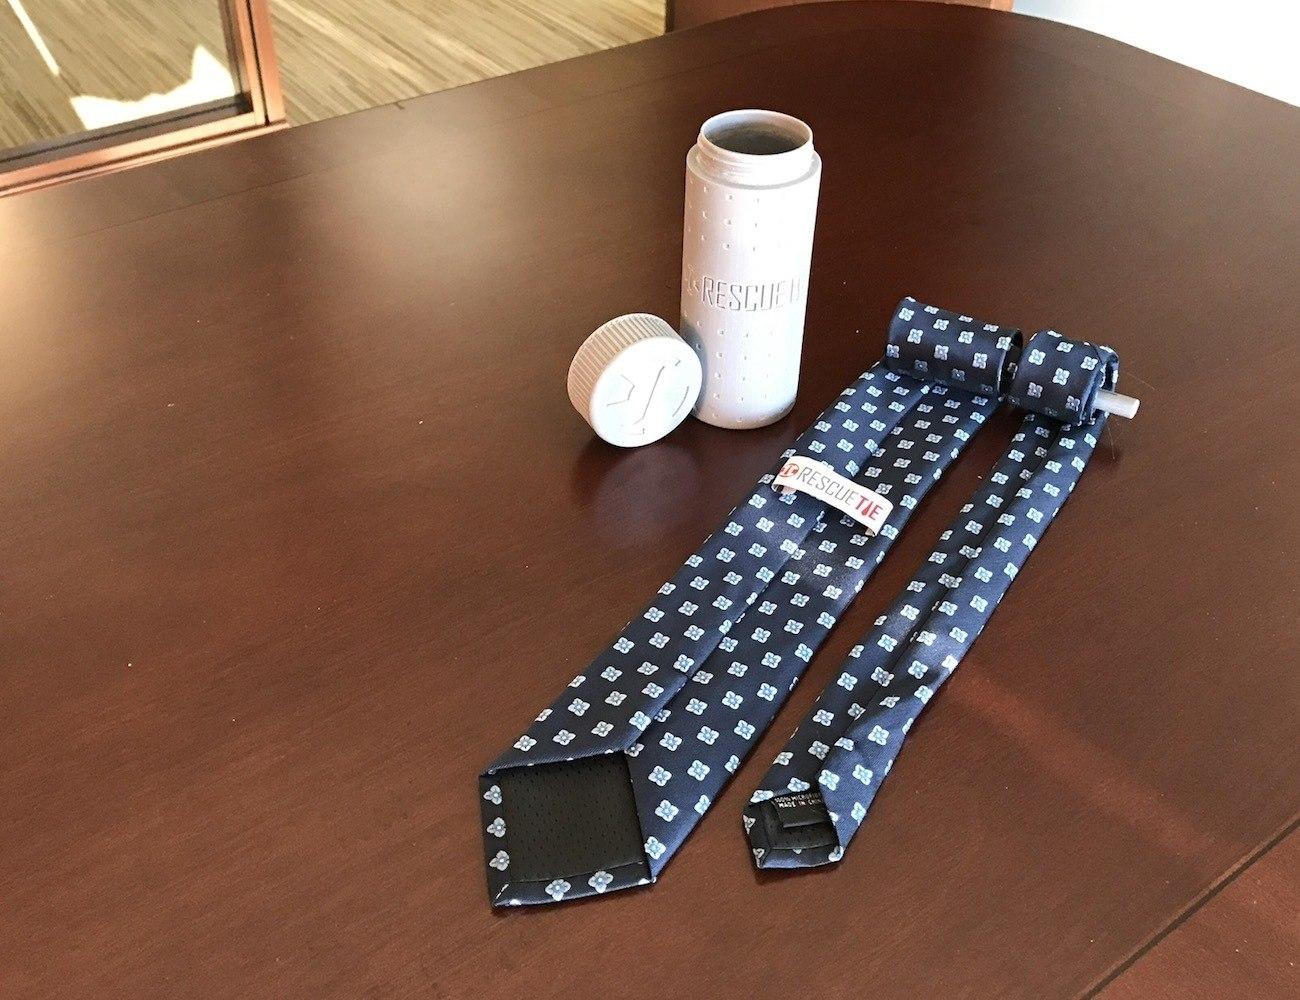 Rescue Tie – Rugged Tie Capsule for Neckwear Emergencies